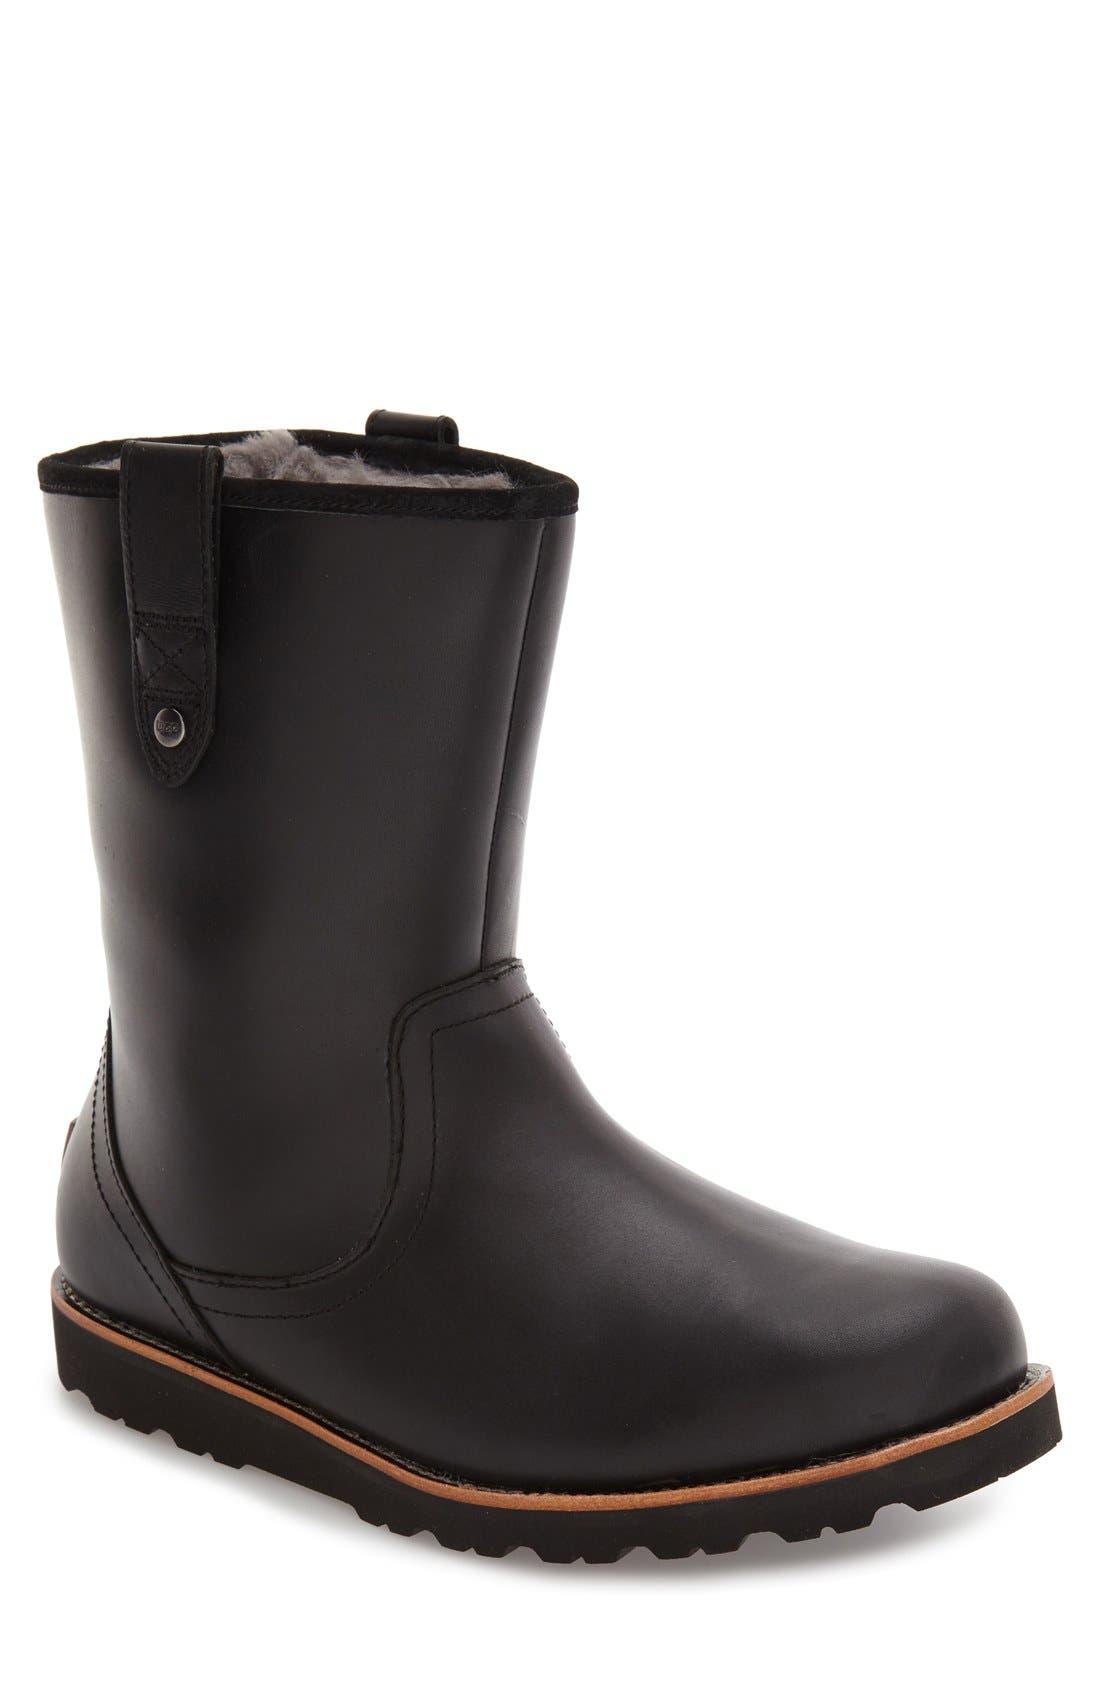 Main Image - UGG® Stoneman Waterproof Boot (Men)